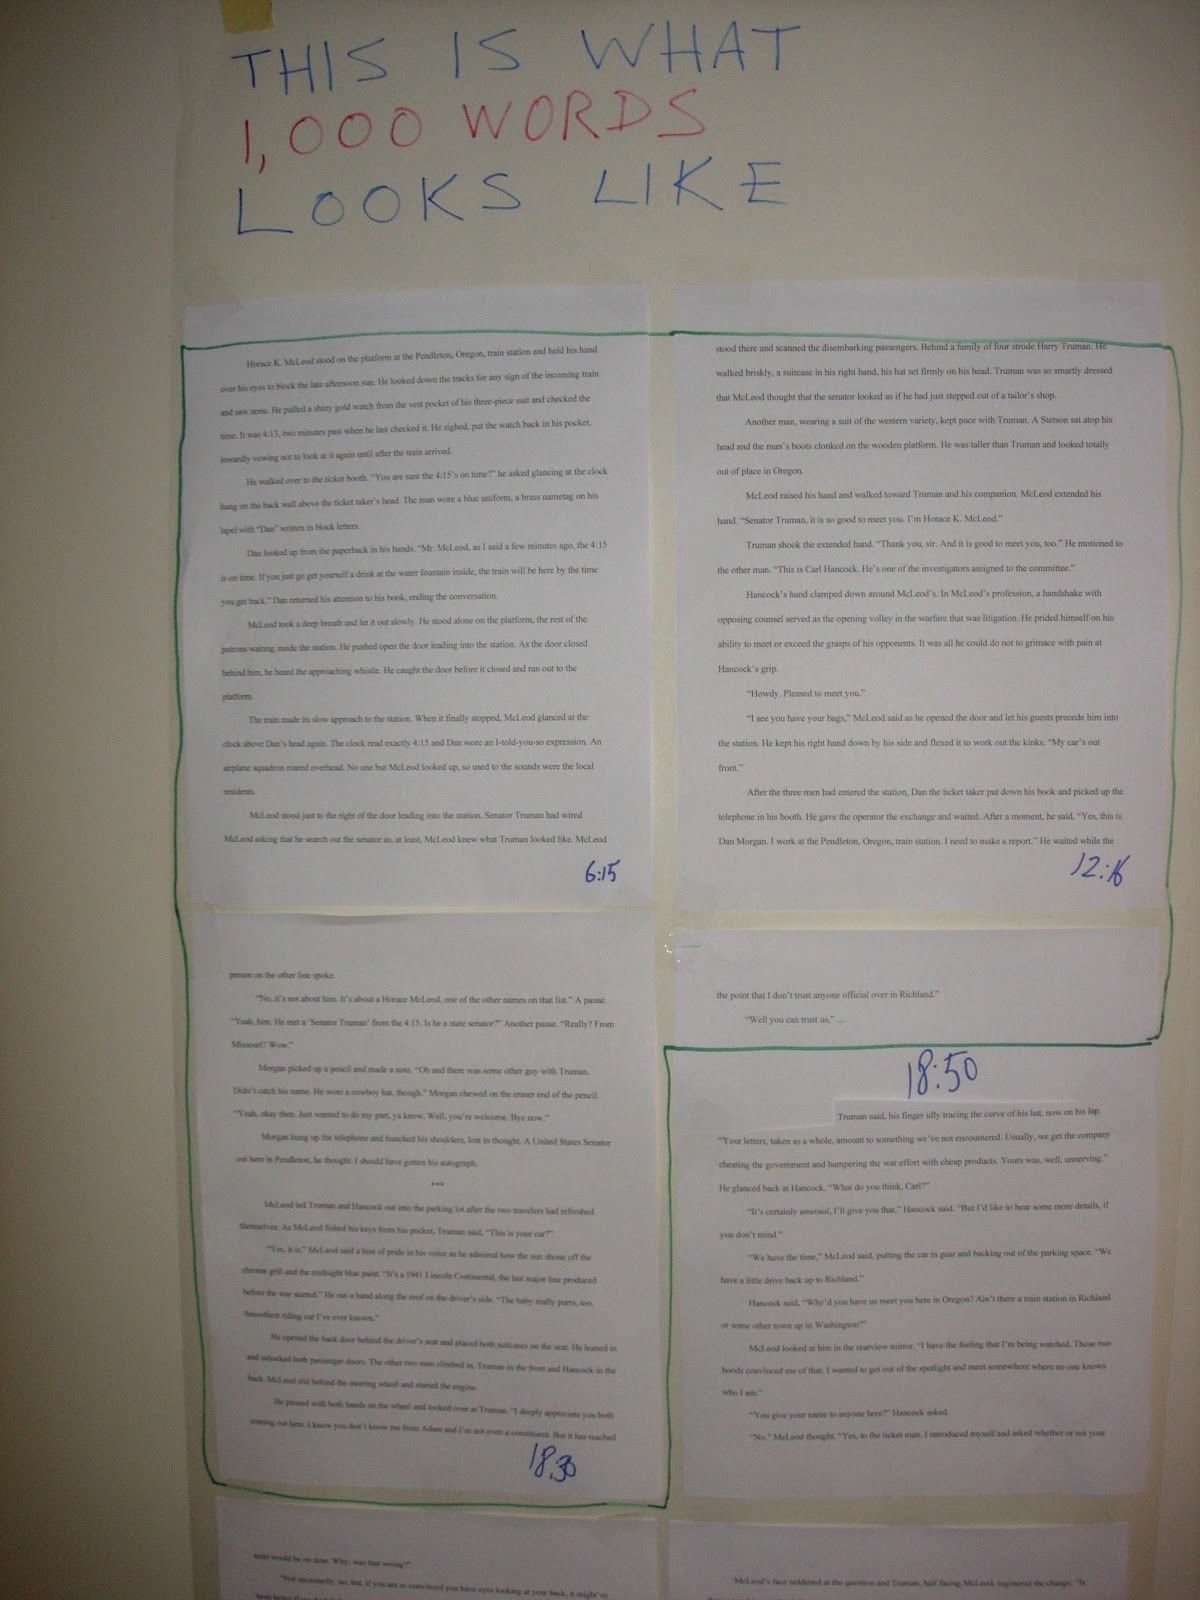 004 Word Essay Pages Dscn4818 Jpg Dreaded 1000 Full